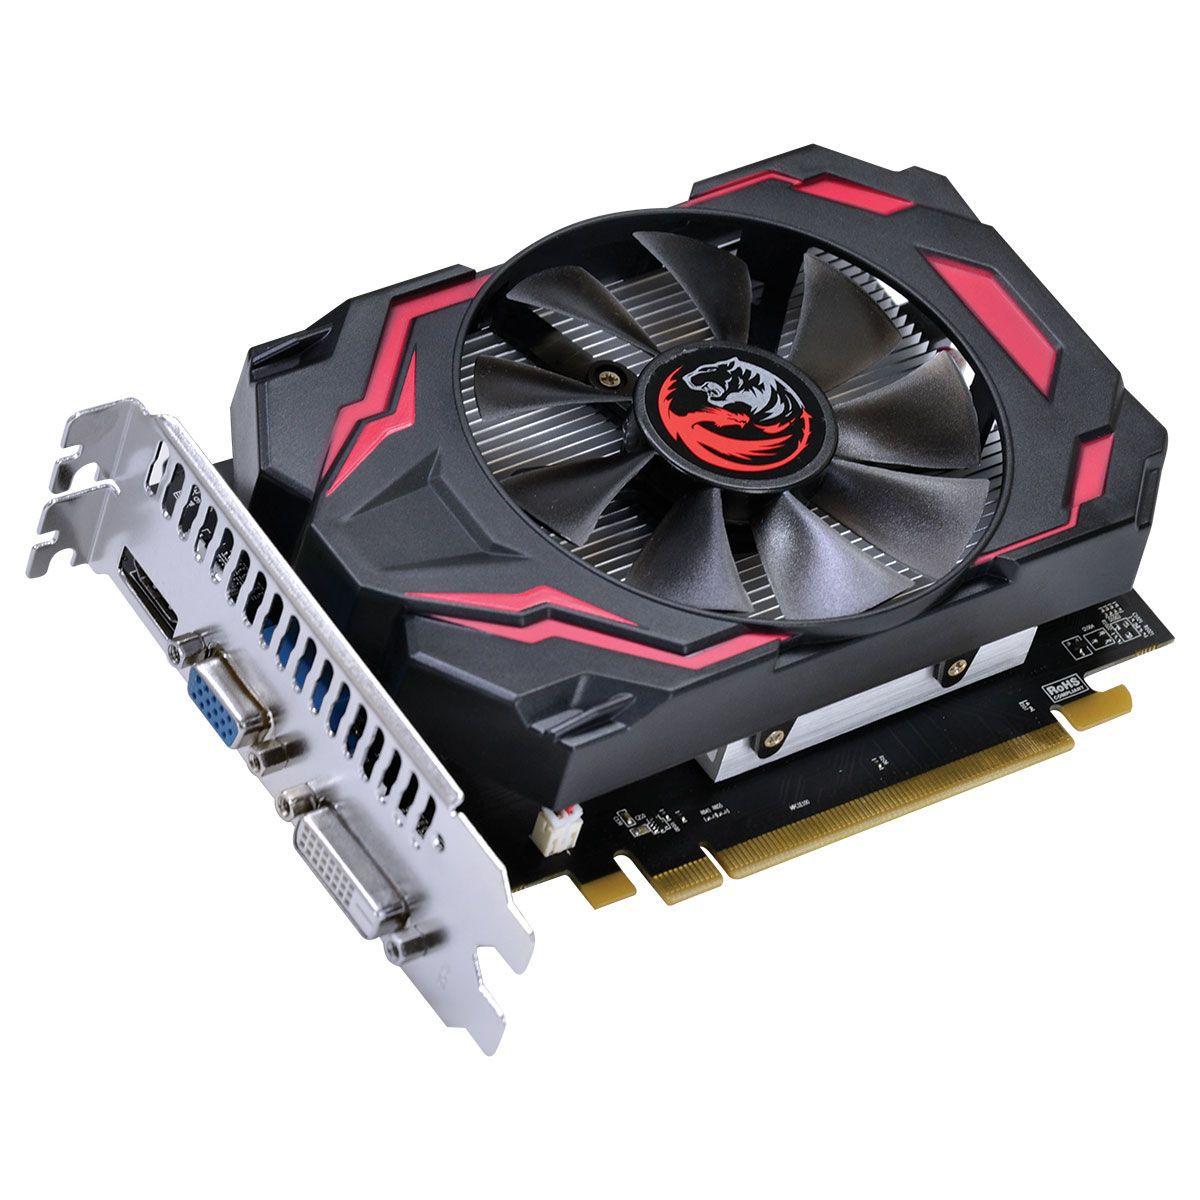 PLACA DE VIDEO PCYES R7 240 4GB DDR5 128 BITS PJ240R71284GD5